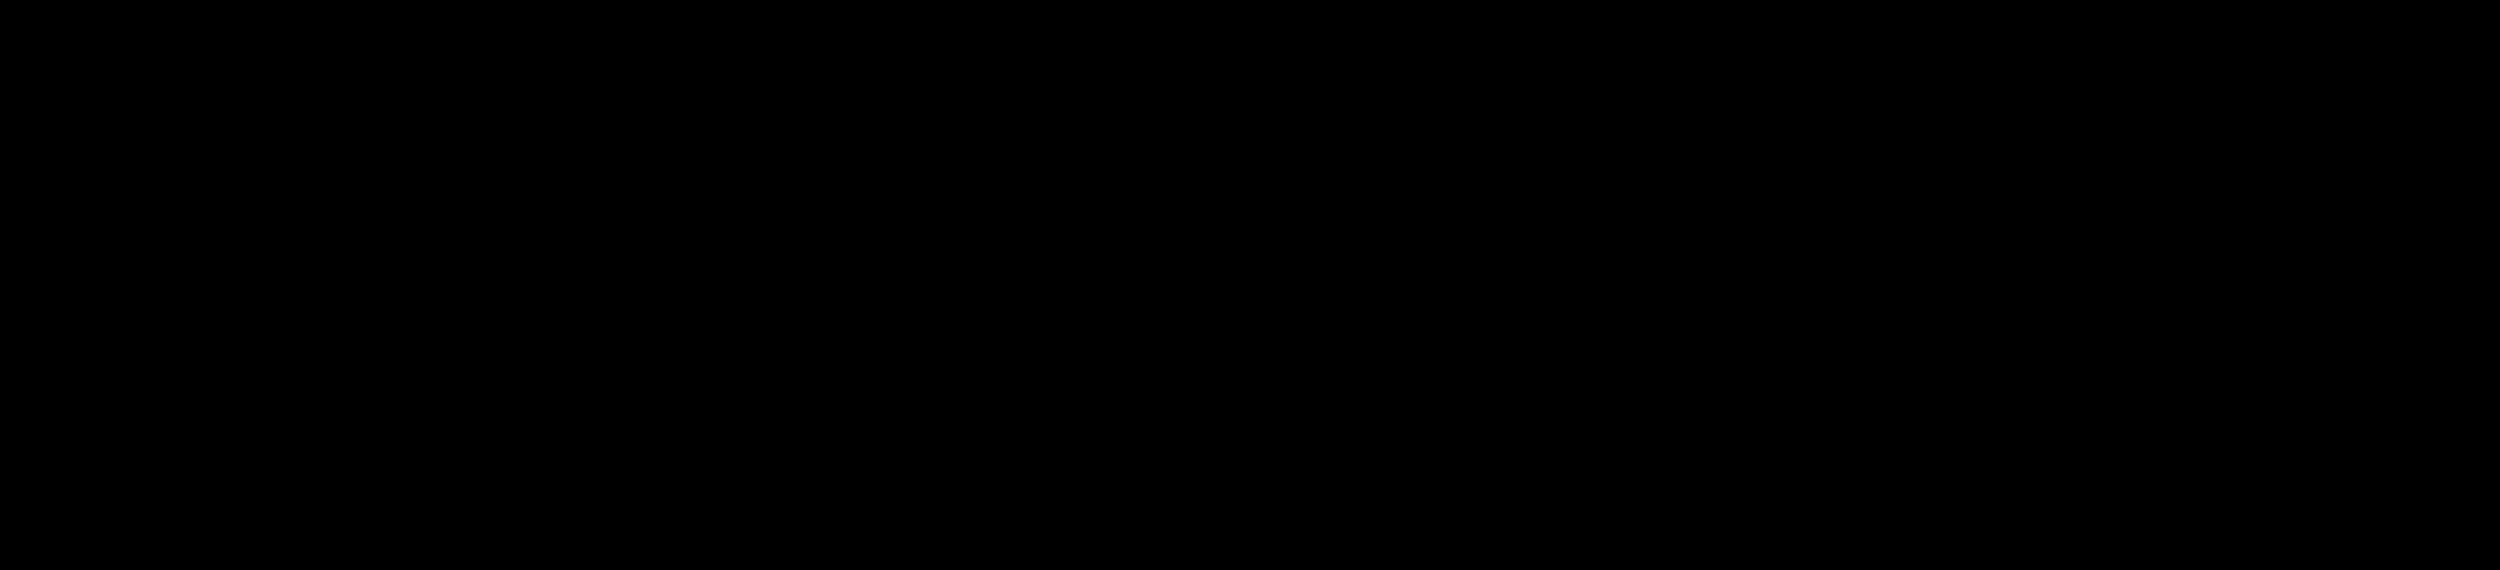 Conta-logo-09.png